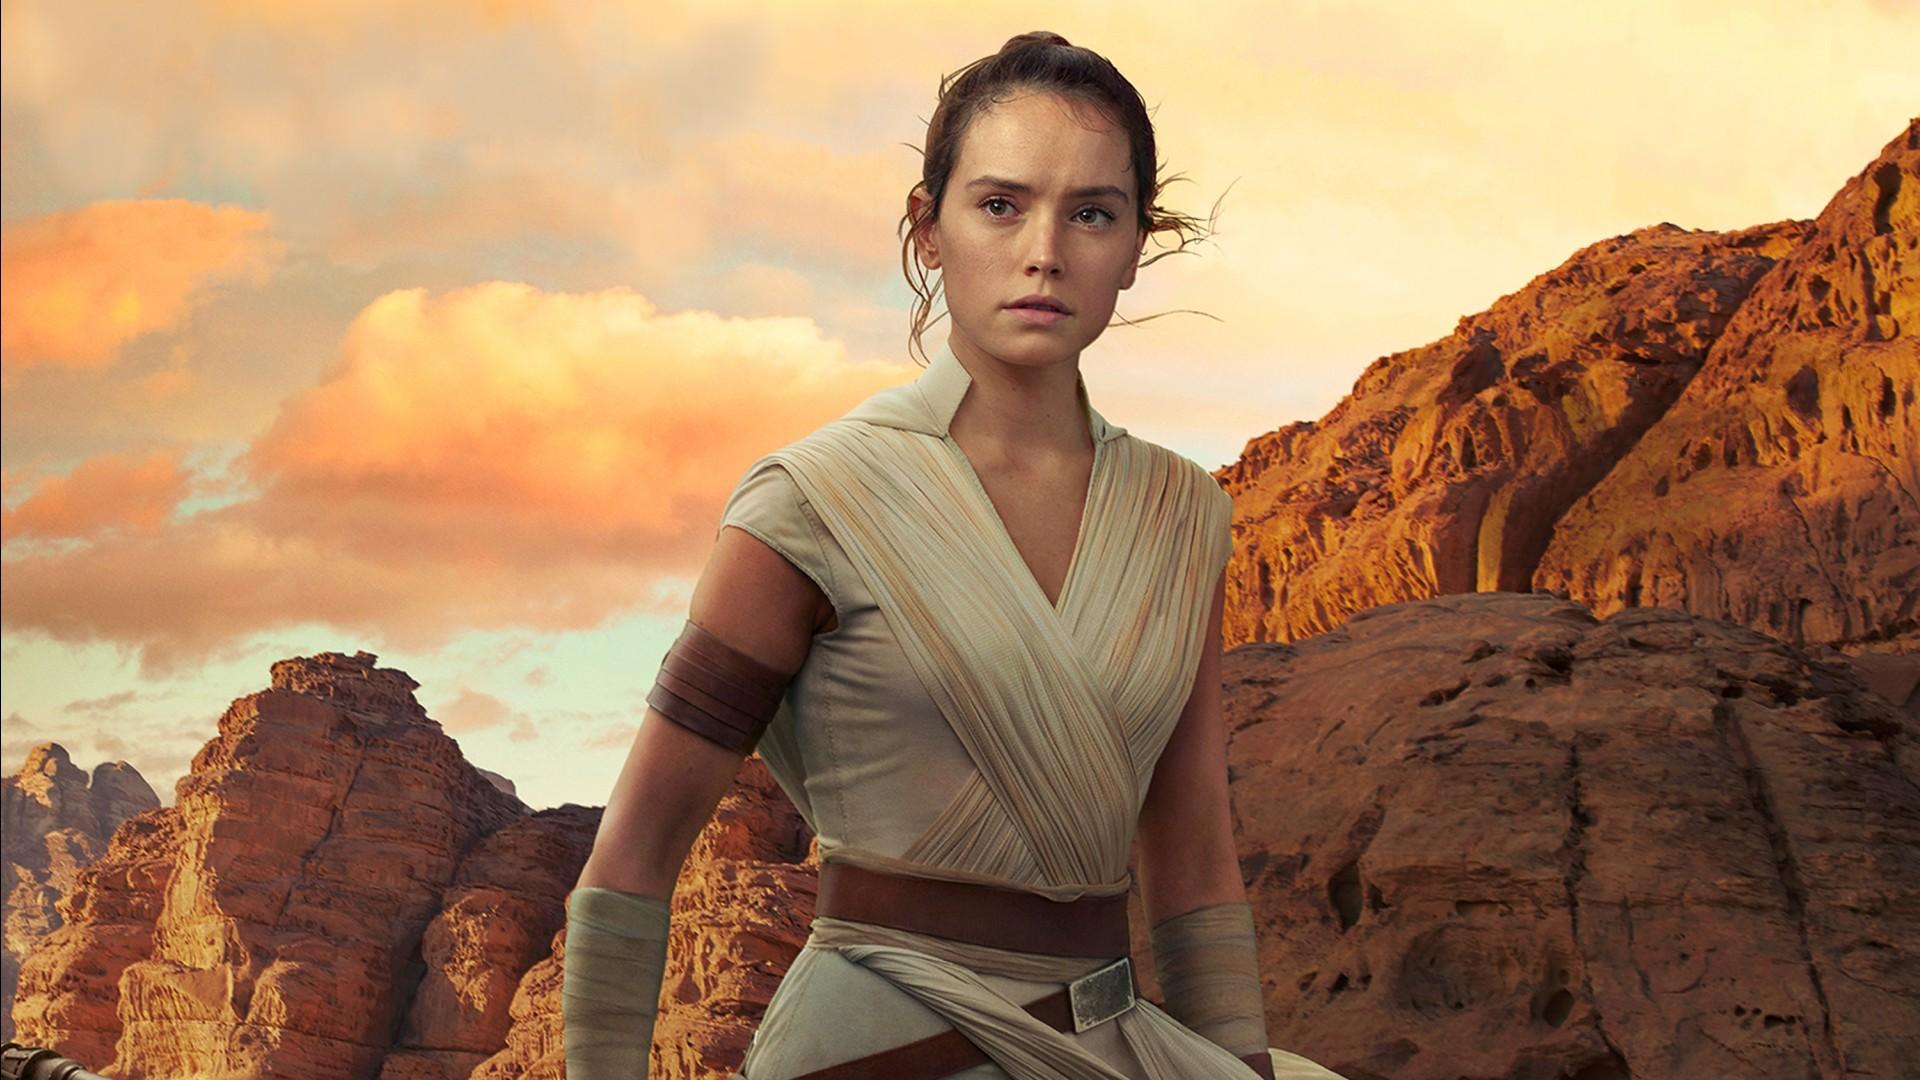 Rise of Skywalker Daisy Ridley as Rey in Star Wars The Rise of Skywalker ...